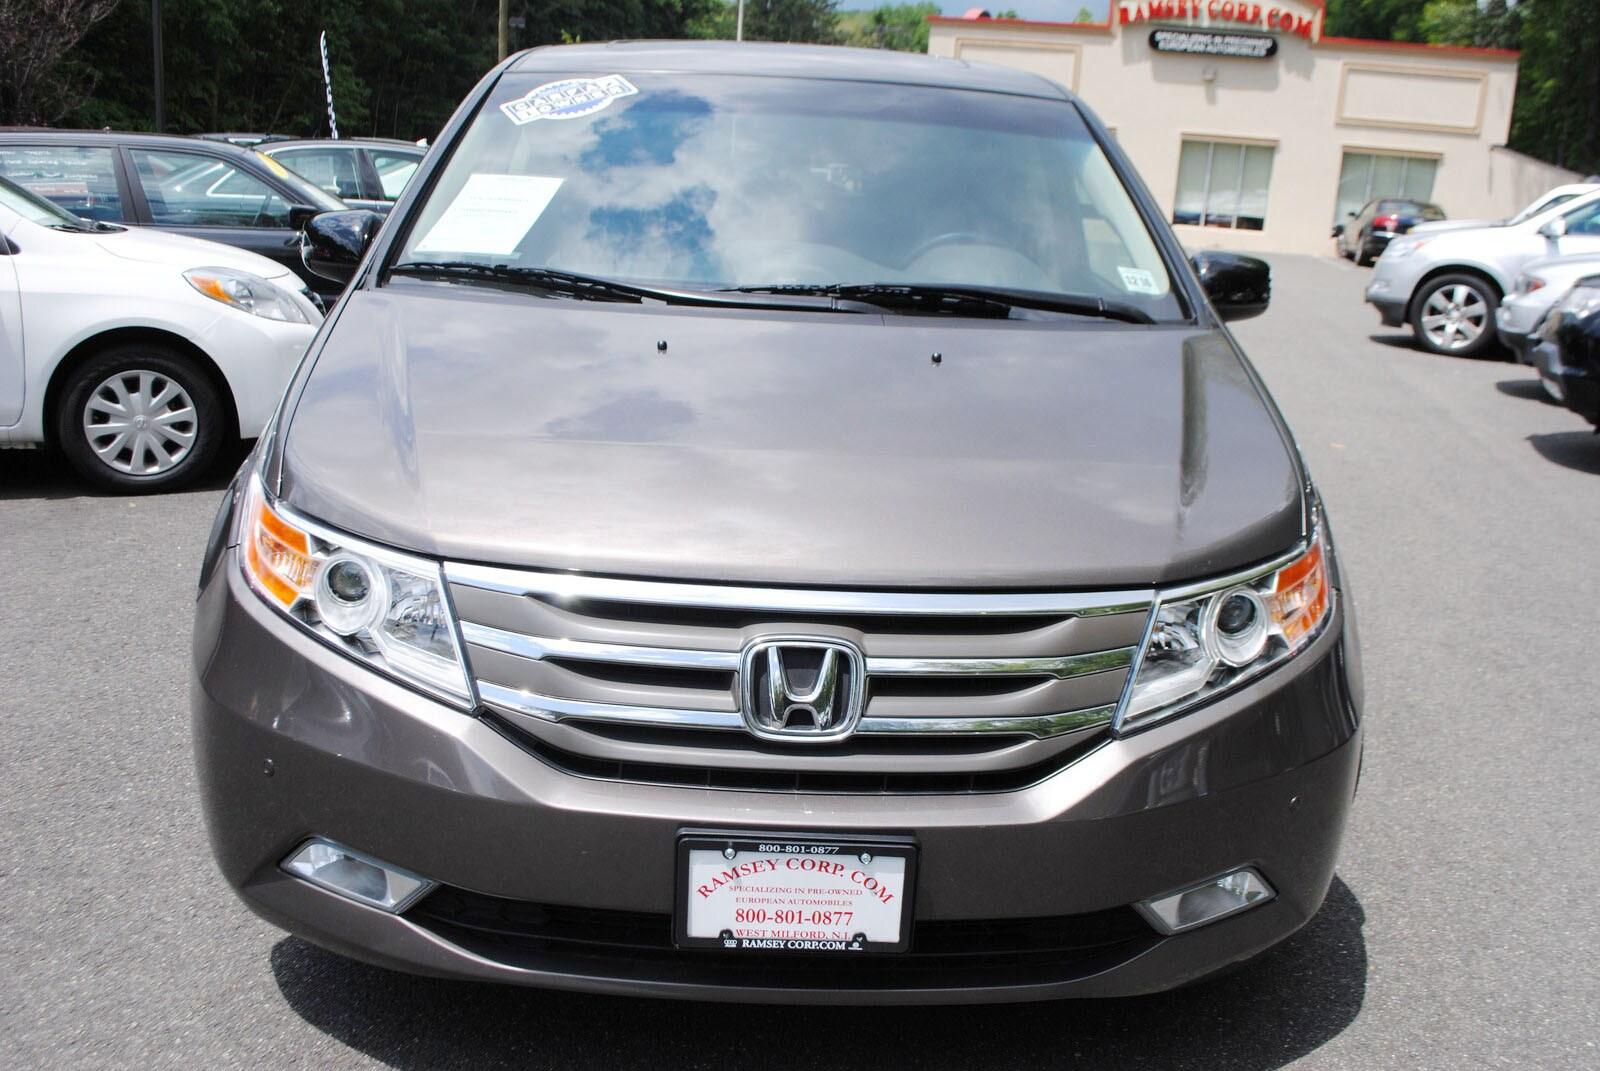 Used 2011 Honda Odyssey For Sale West Milford Nj